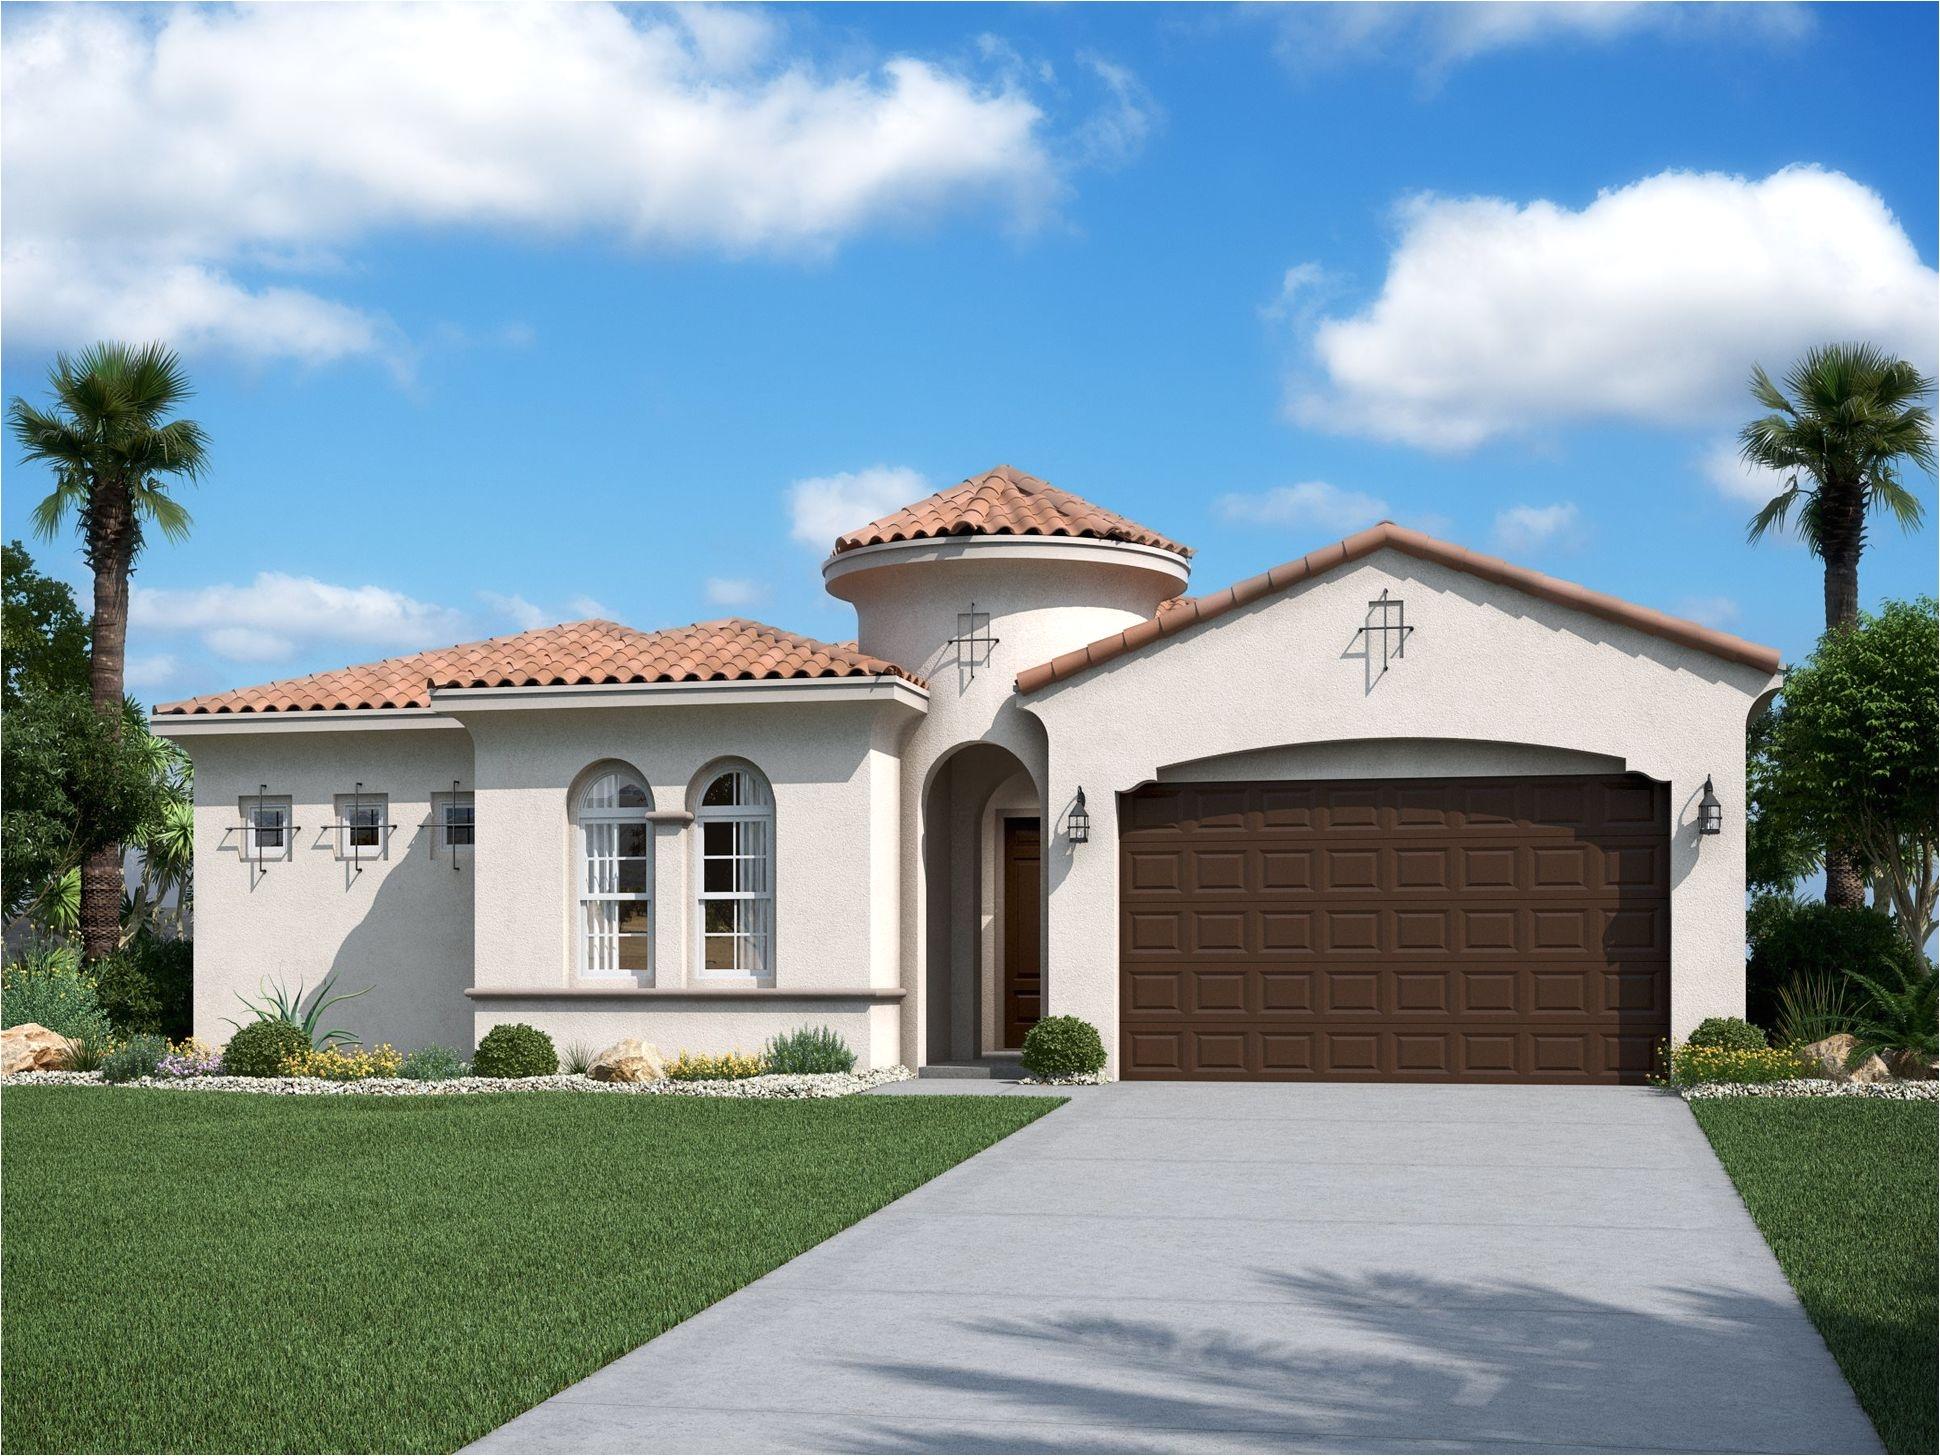 calatlantic homes 5022 a of the legacy mountain villas community in phoenix az